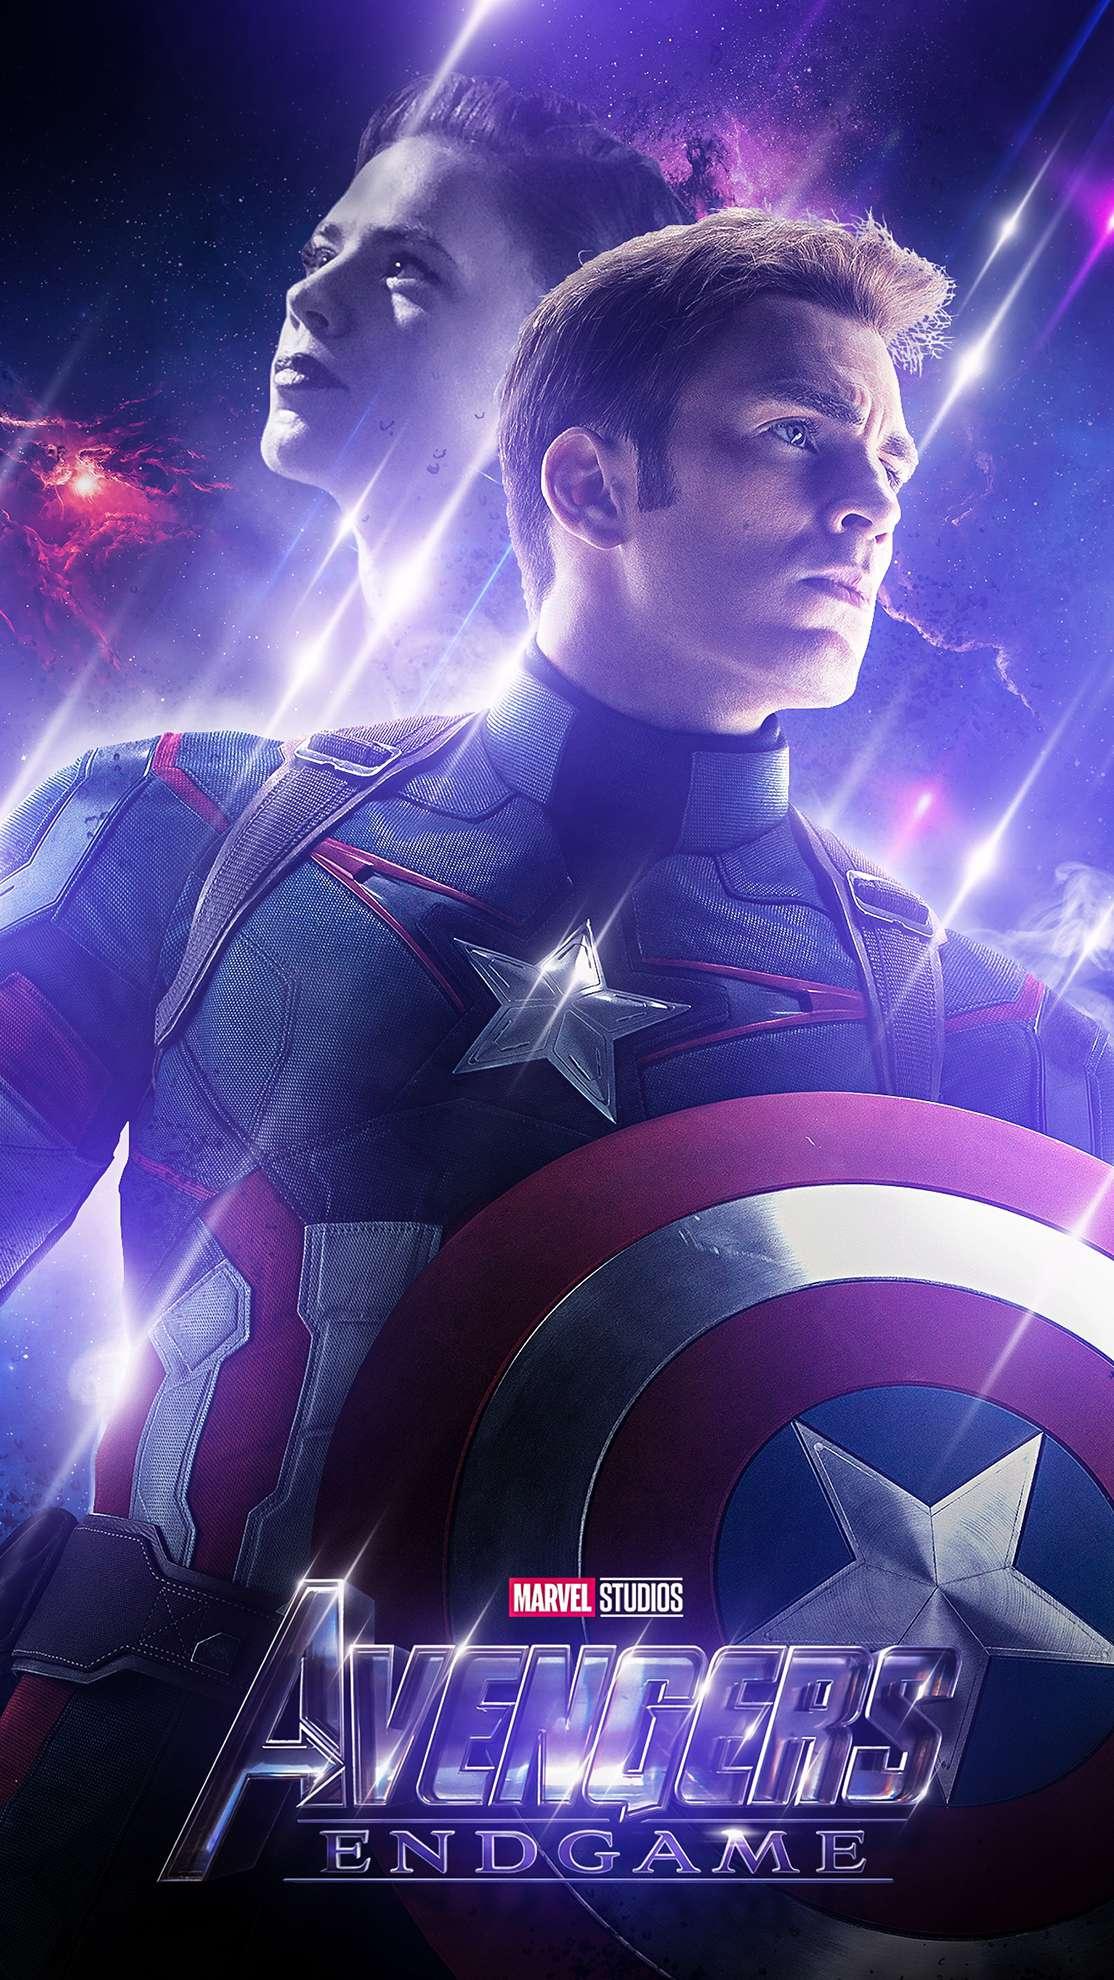 Avengers Endgame Captain America Past iPhone Wallpaper